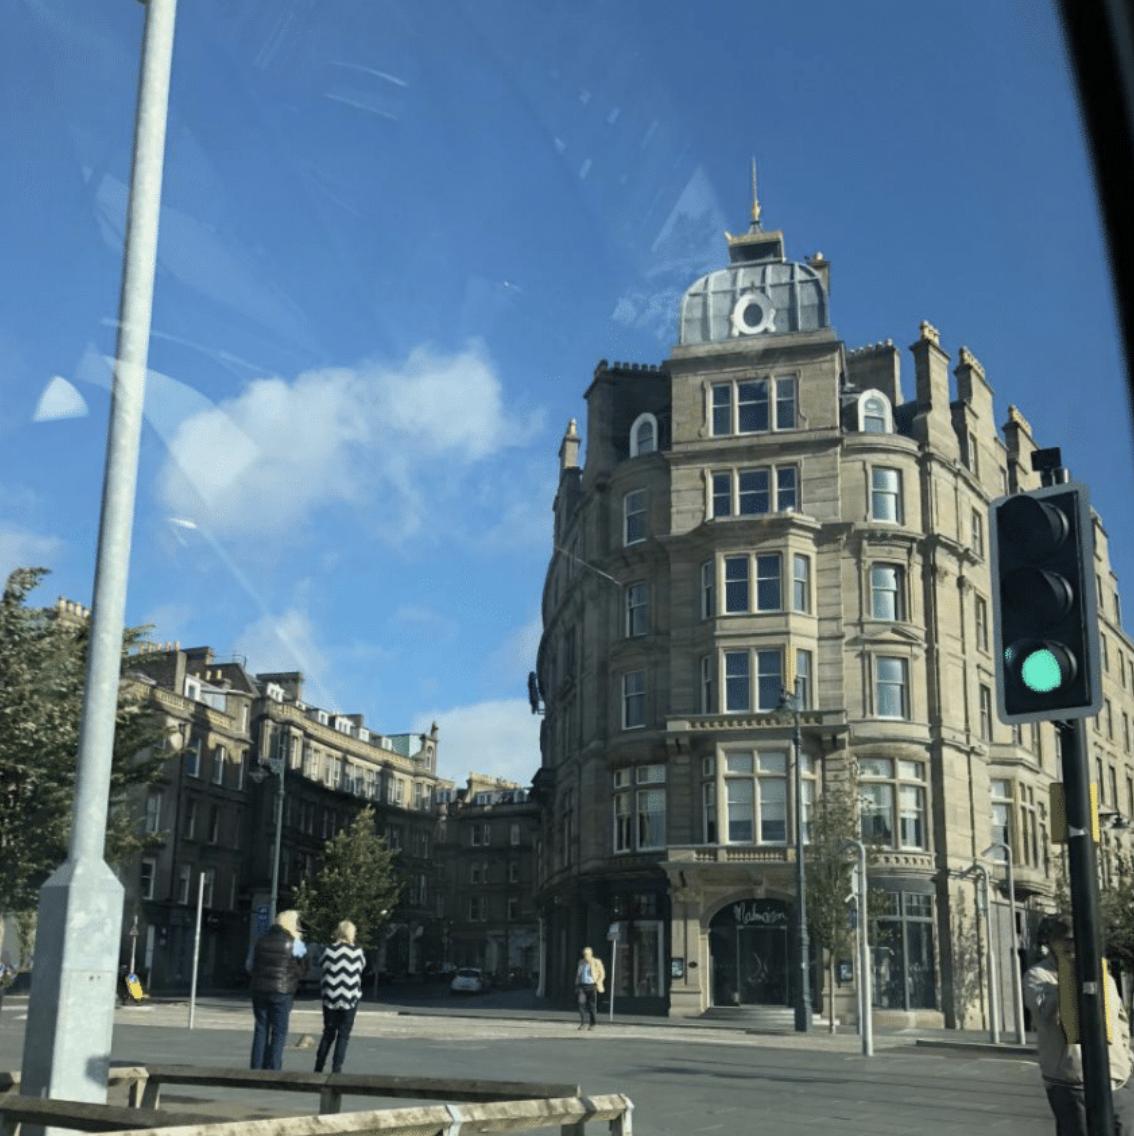 Malmaison_Hotel_Dundee.png